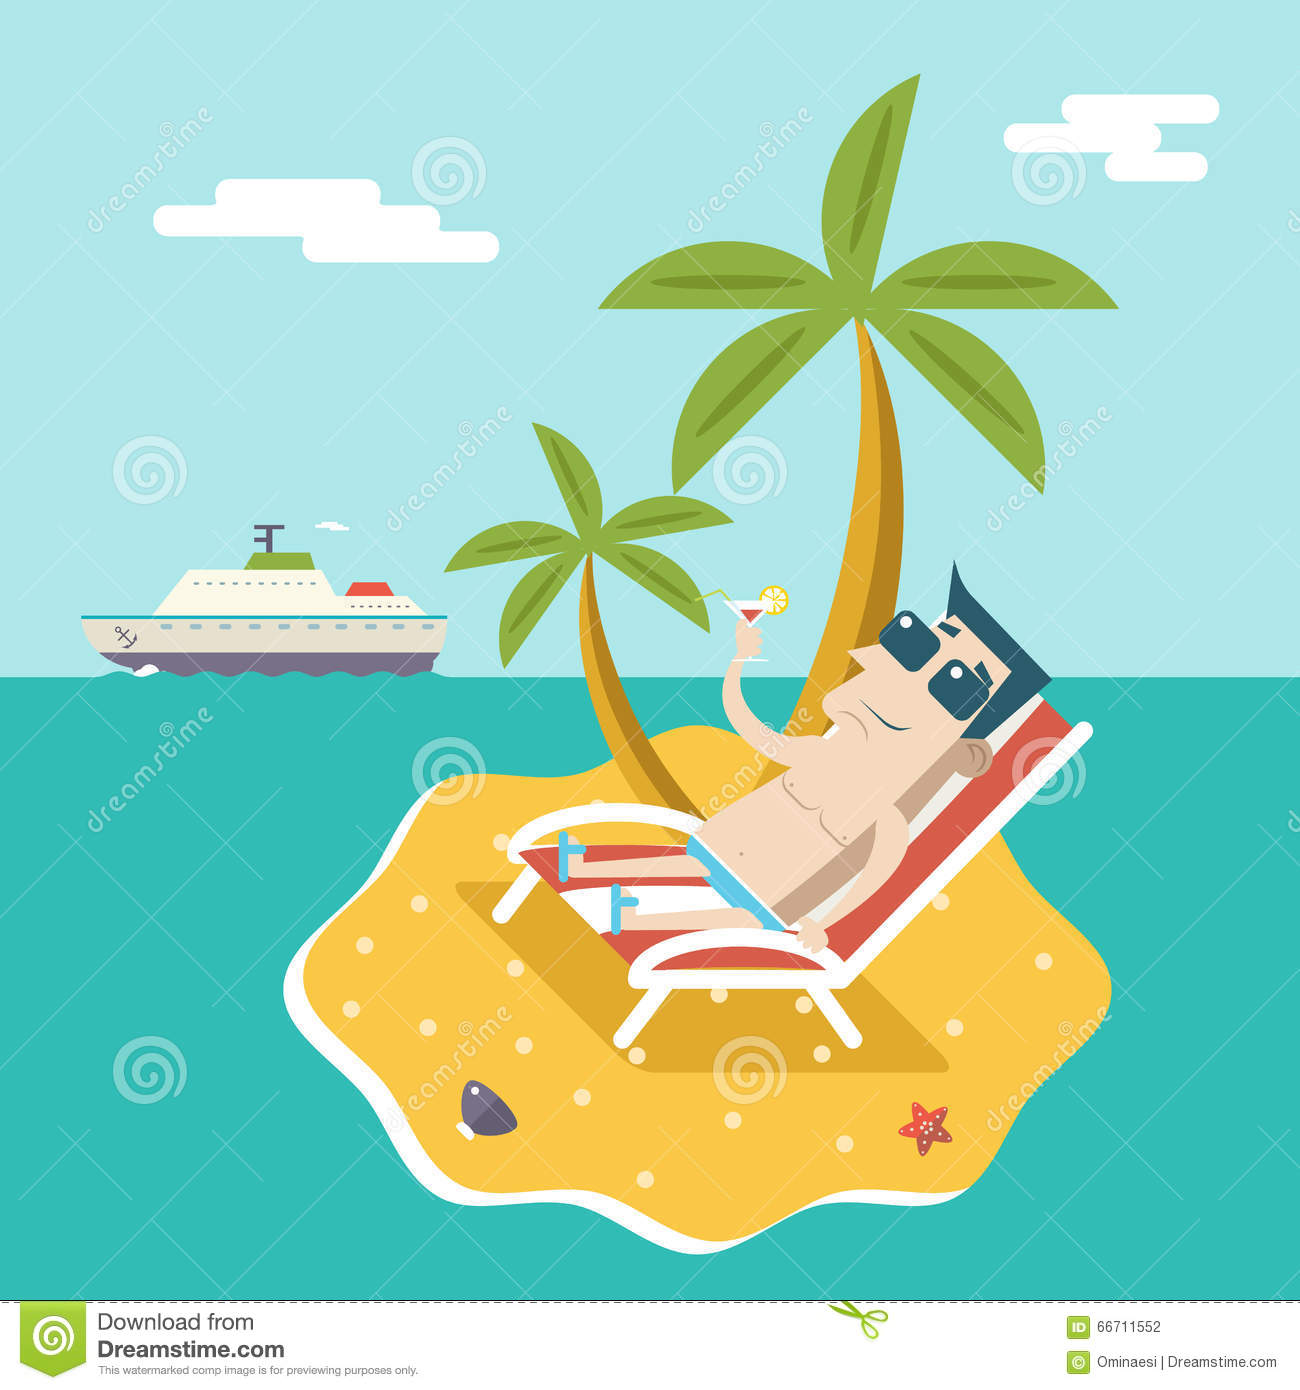 Cartoon Man Character Summer Travel Vacation Sea Island Mobile.